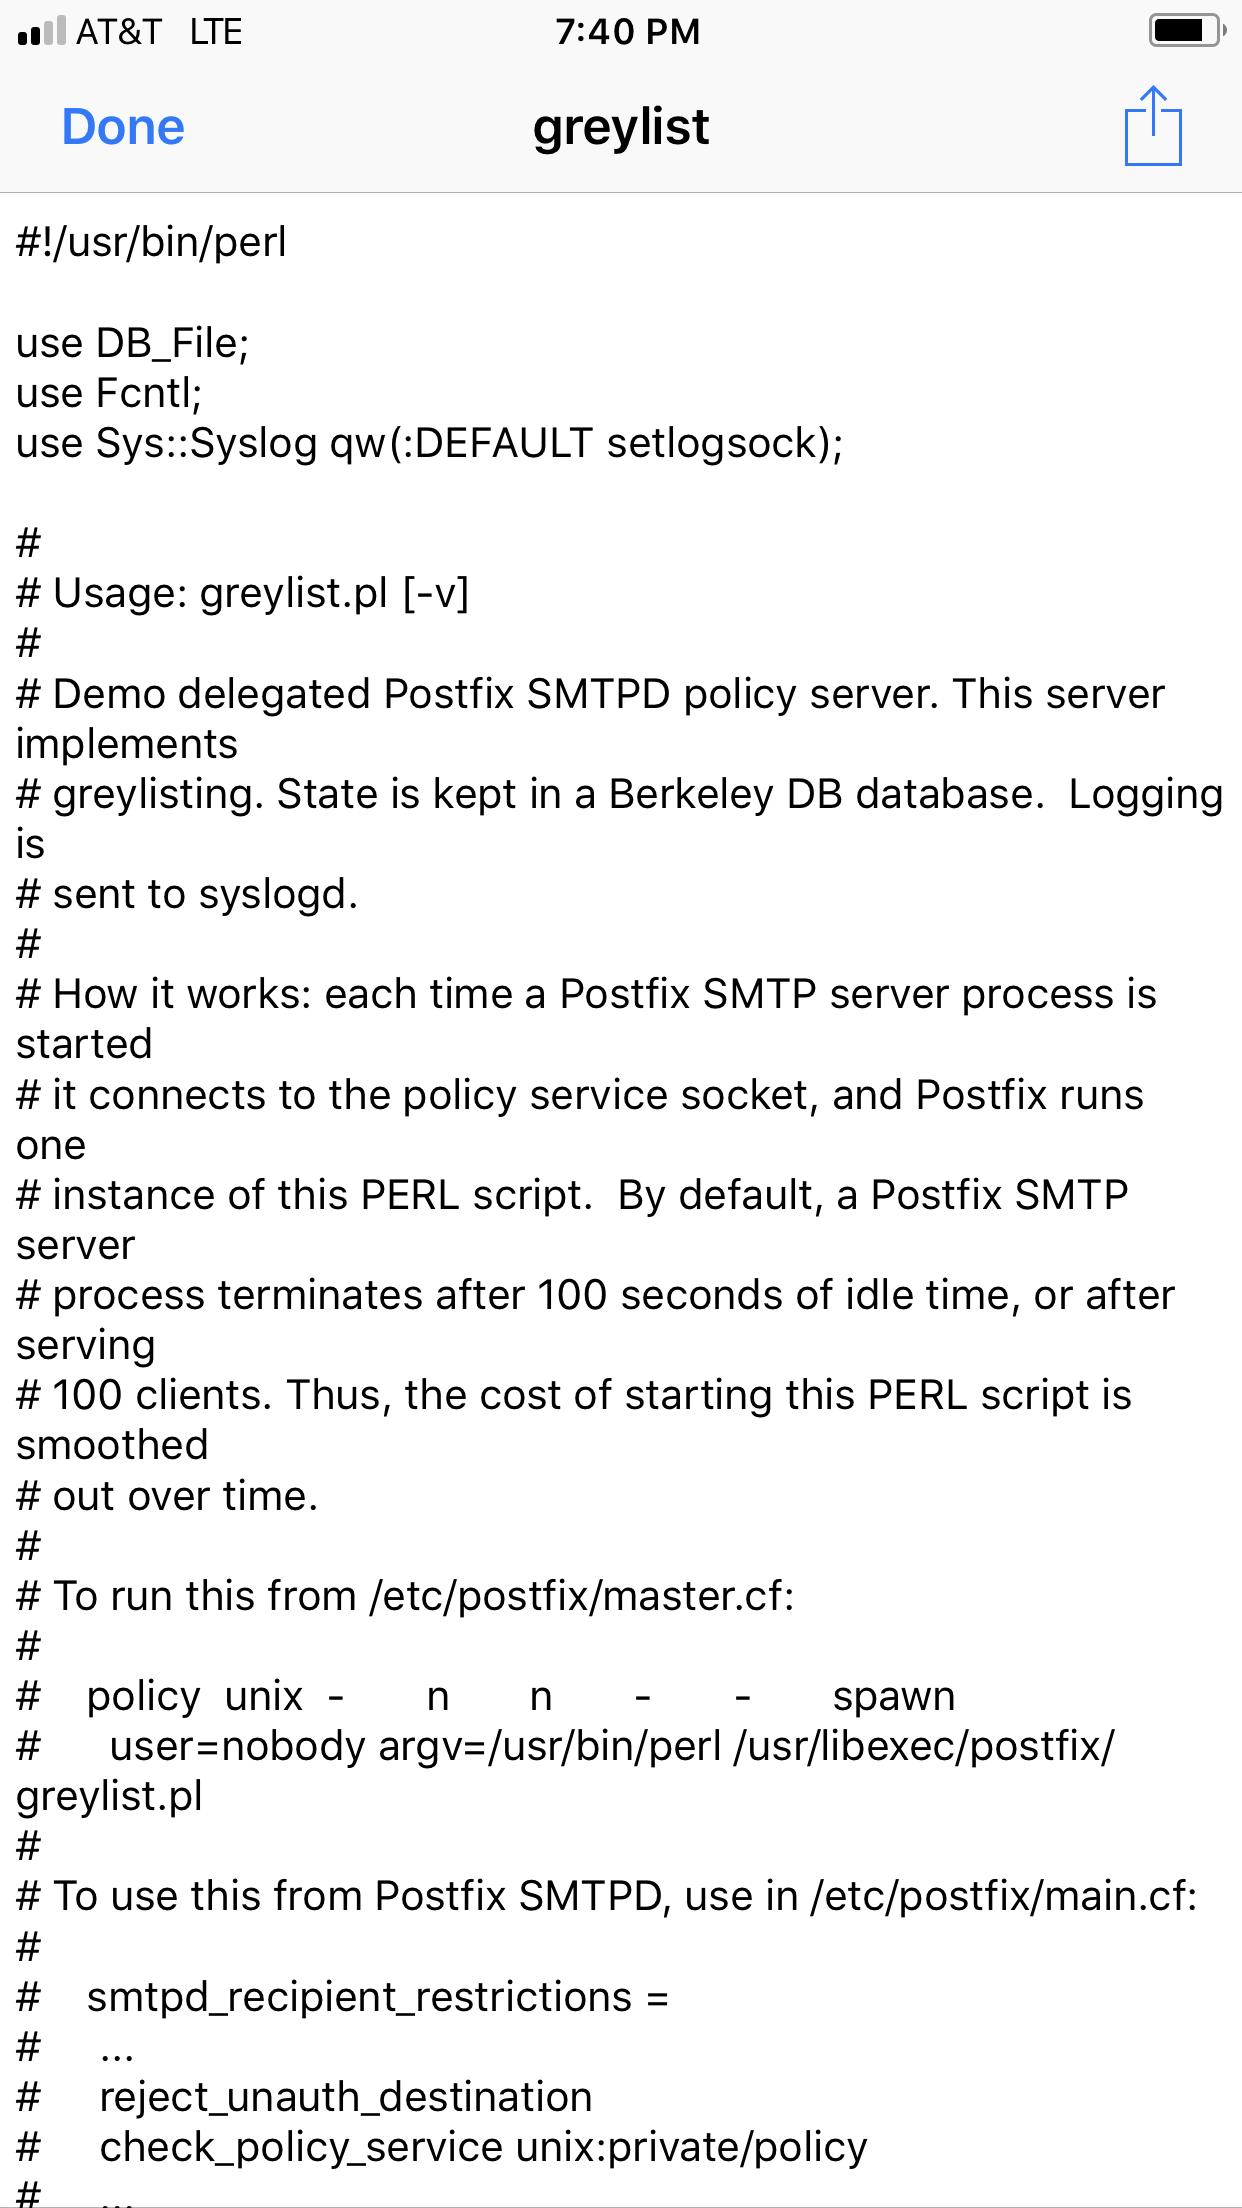 My MACBOOK PRO was hacked using ZOOM Vide… - Apple Community